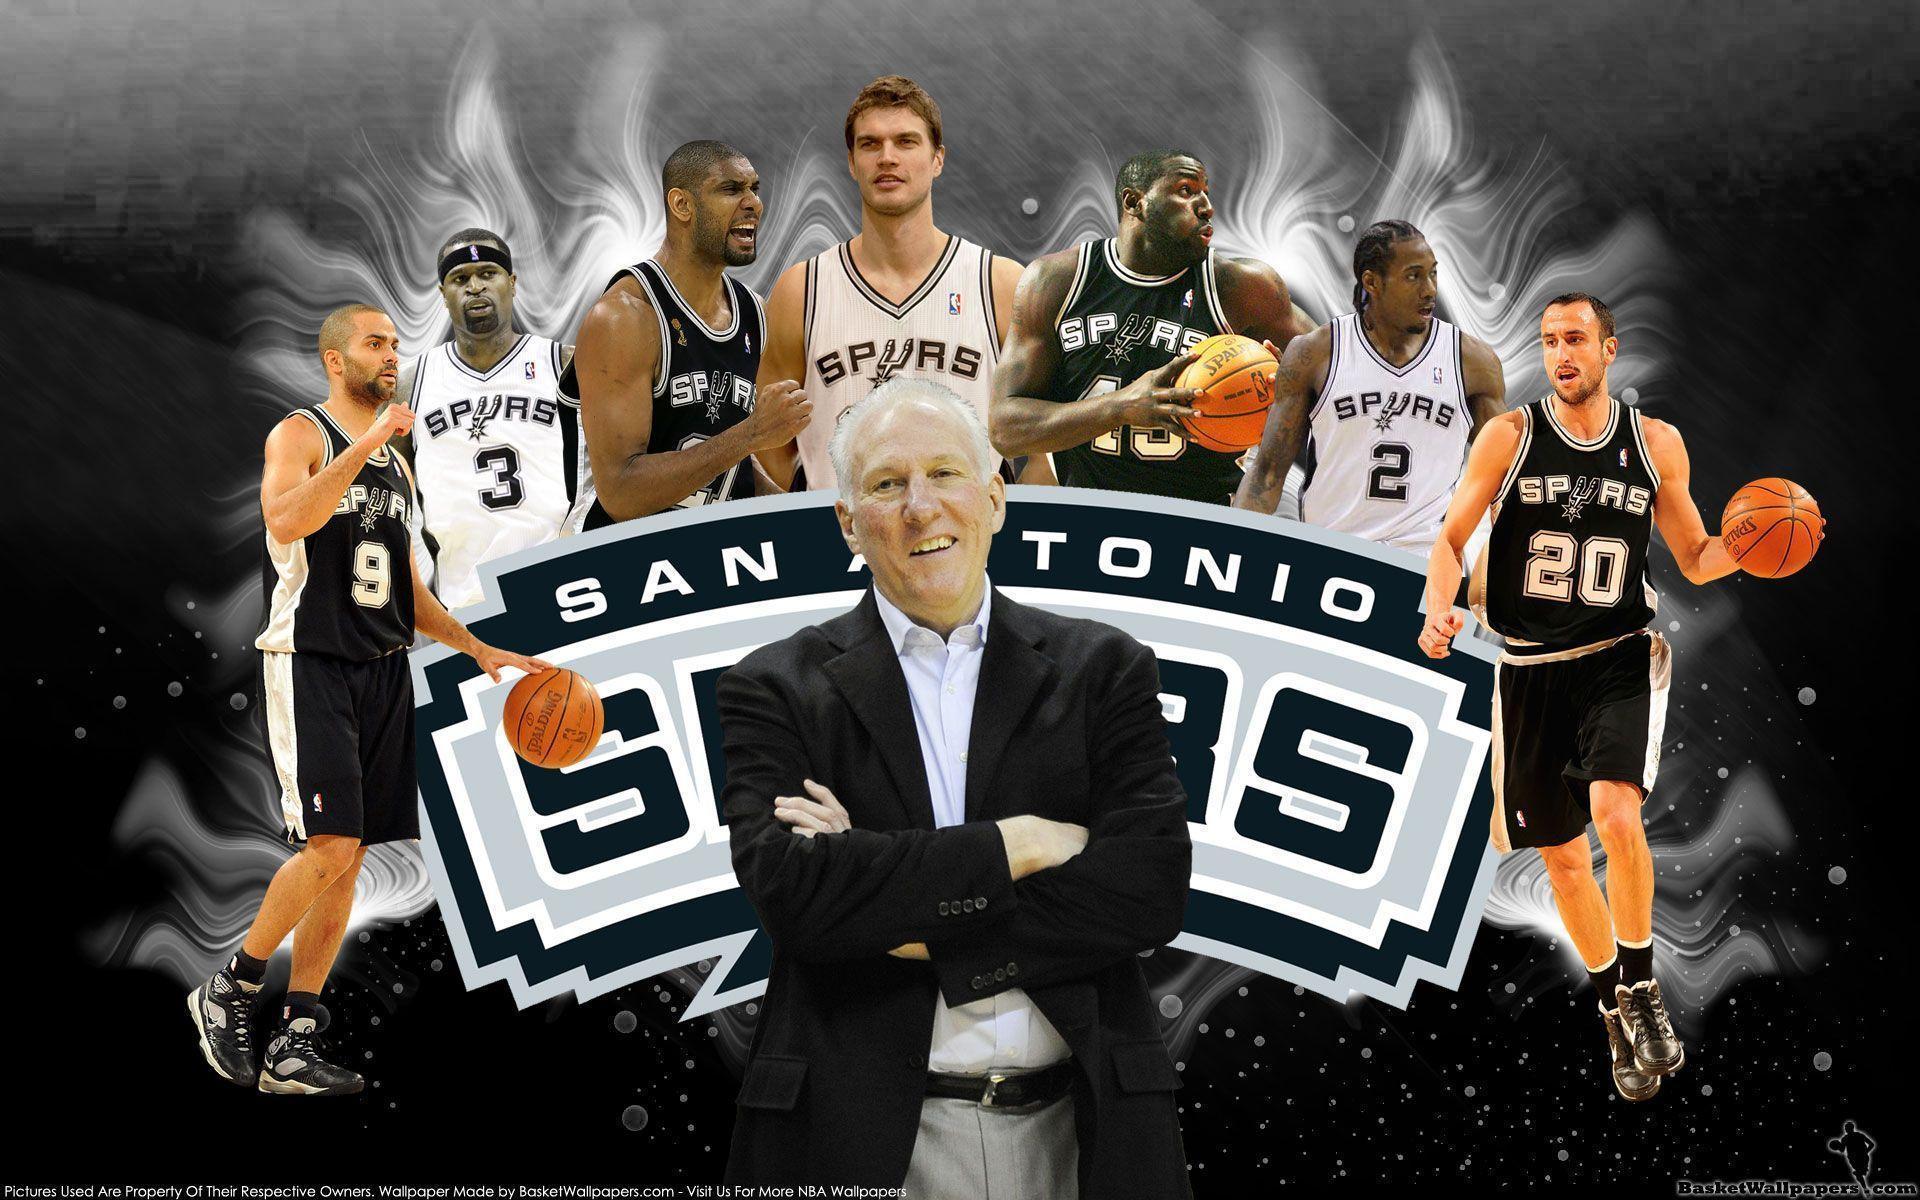 San Antonio Spurs Wallpapers 2015 - Wallpaper Cave